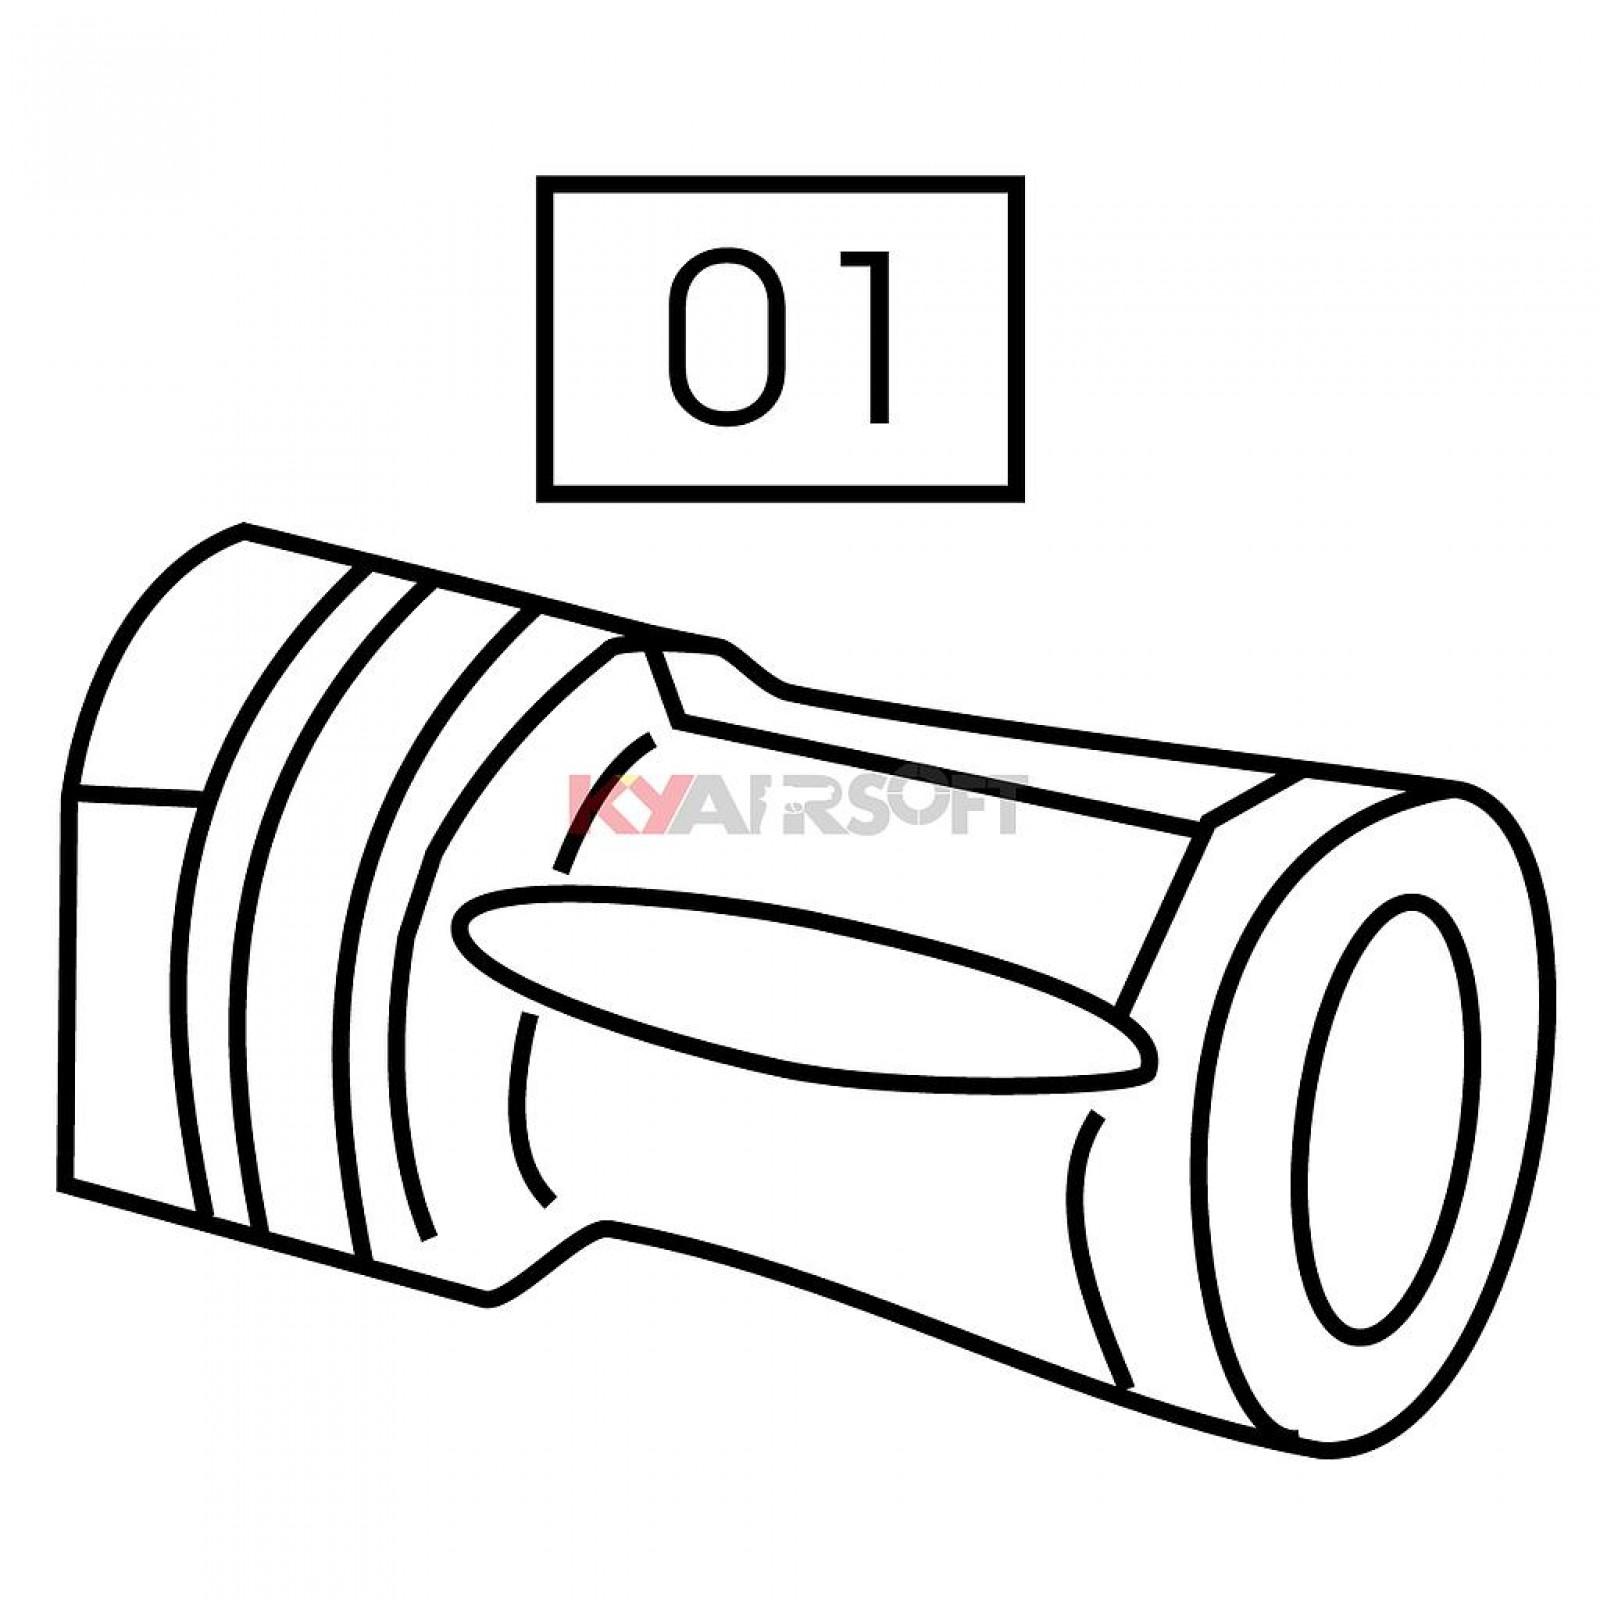 M4 1 Gbbr